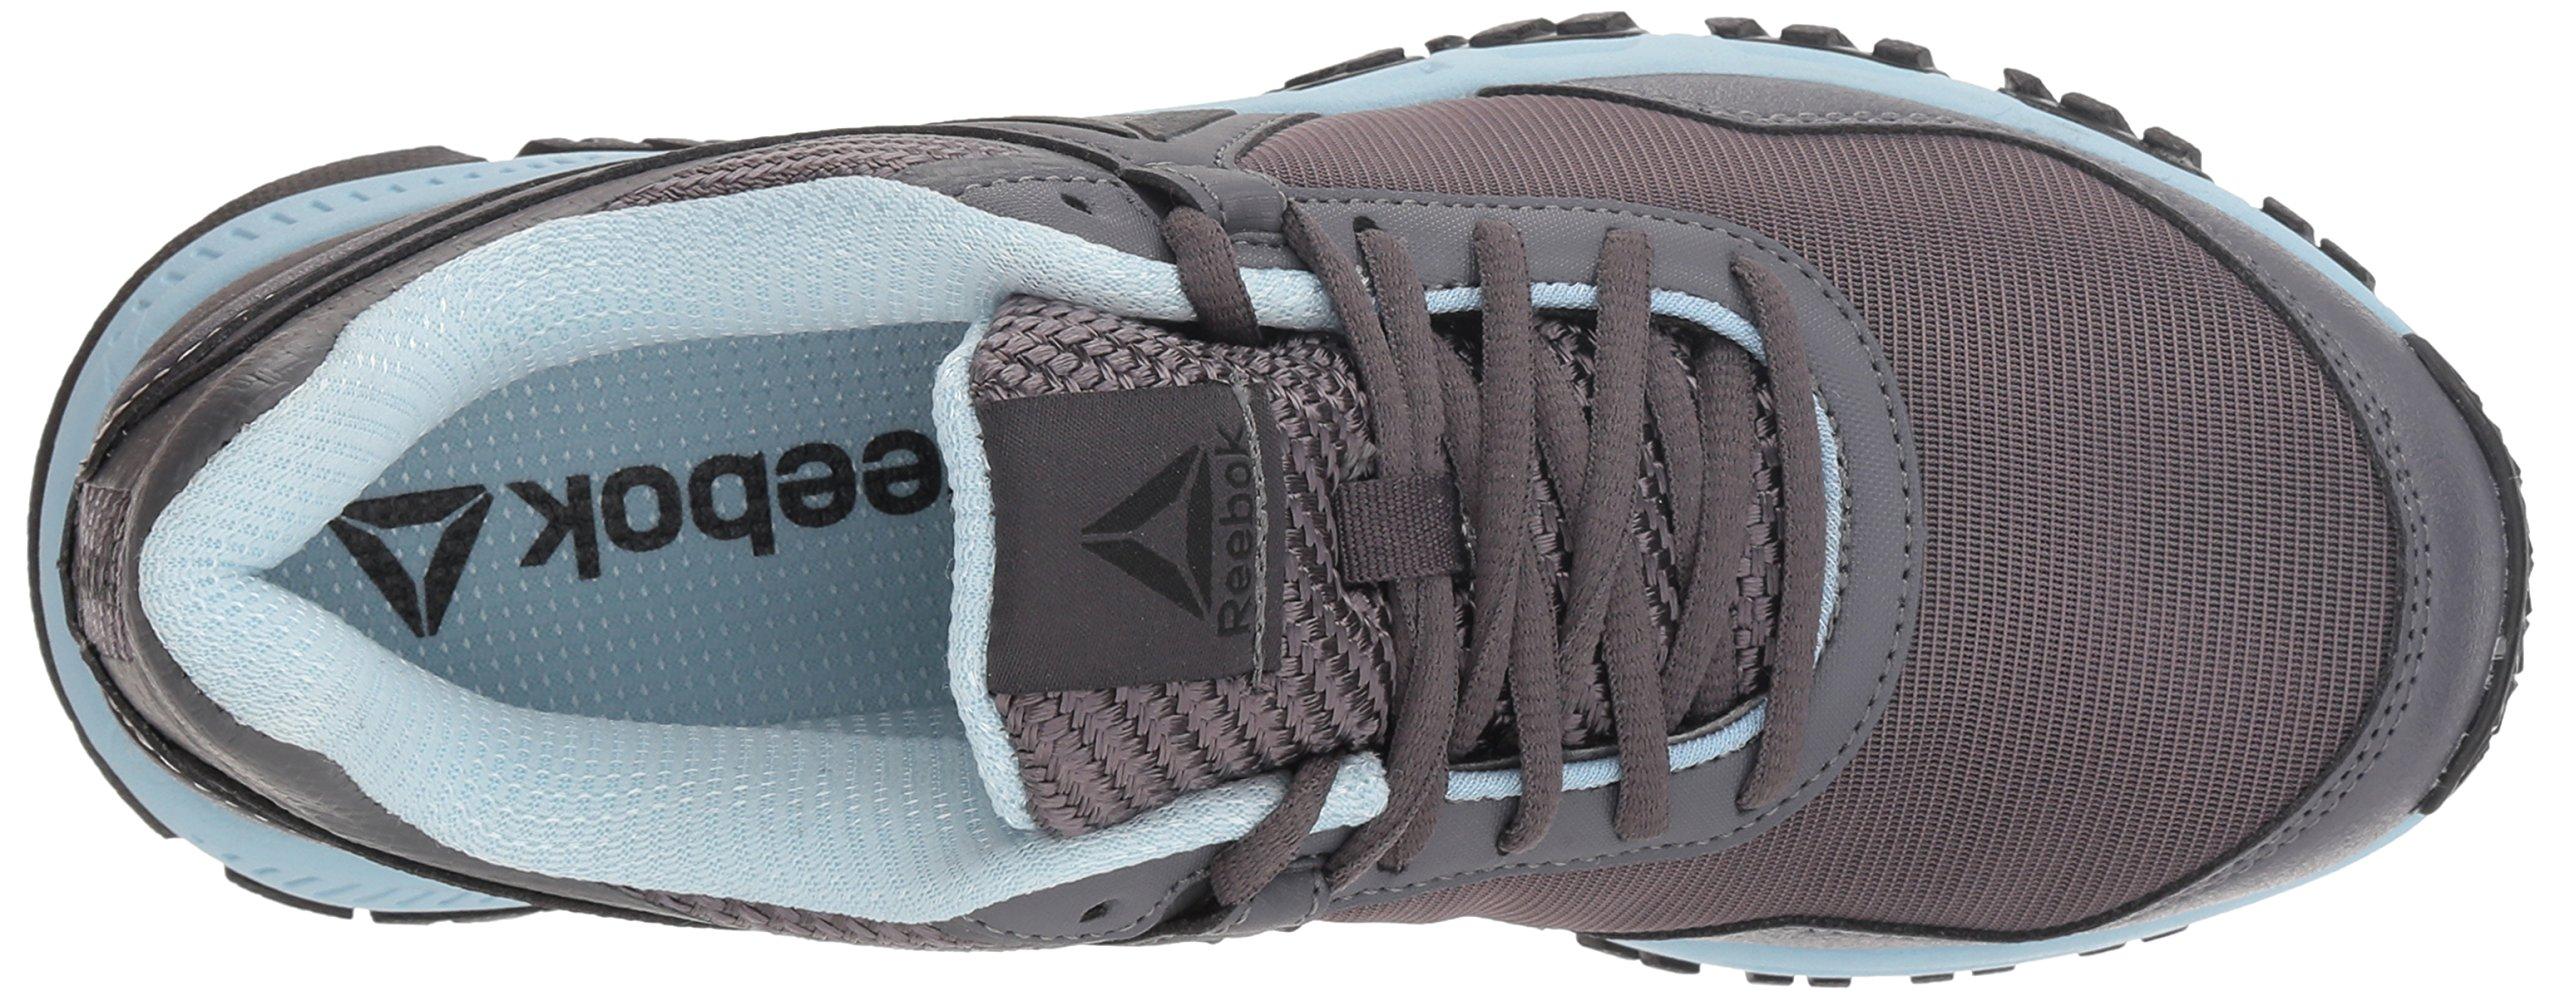 Reebok Women's Ridgerider Trail 3.0 Walking Shoe, ash Grey/Dreamy Blue/blac, 7.5 M US by Reebok (Image #7)